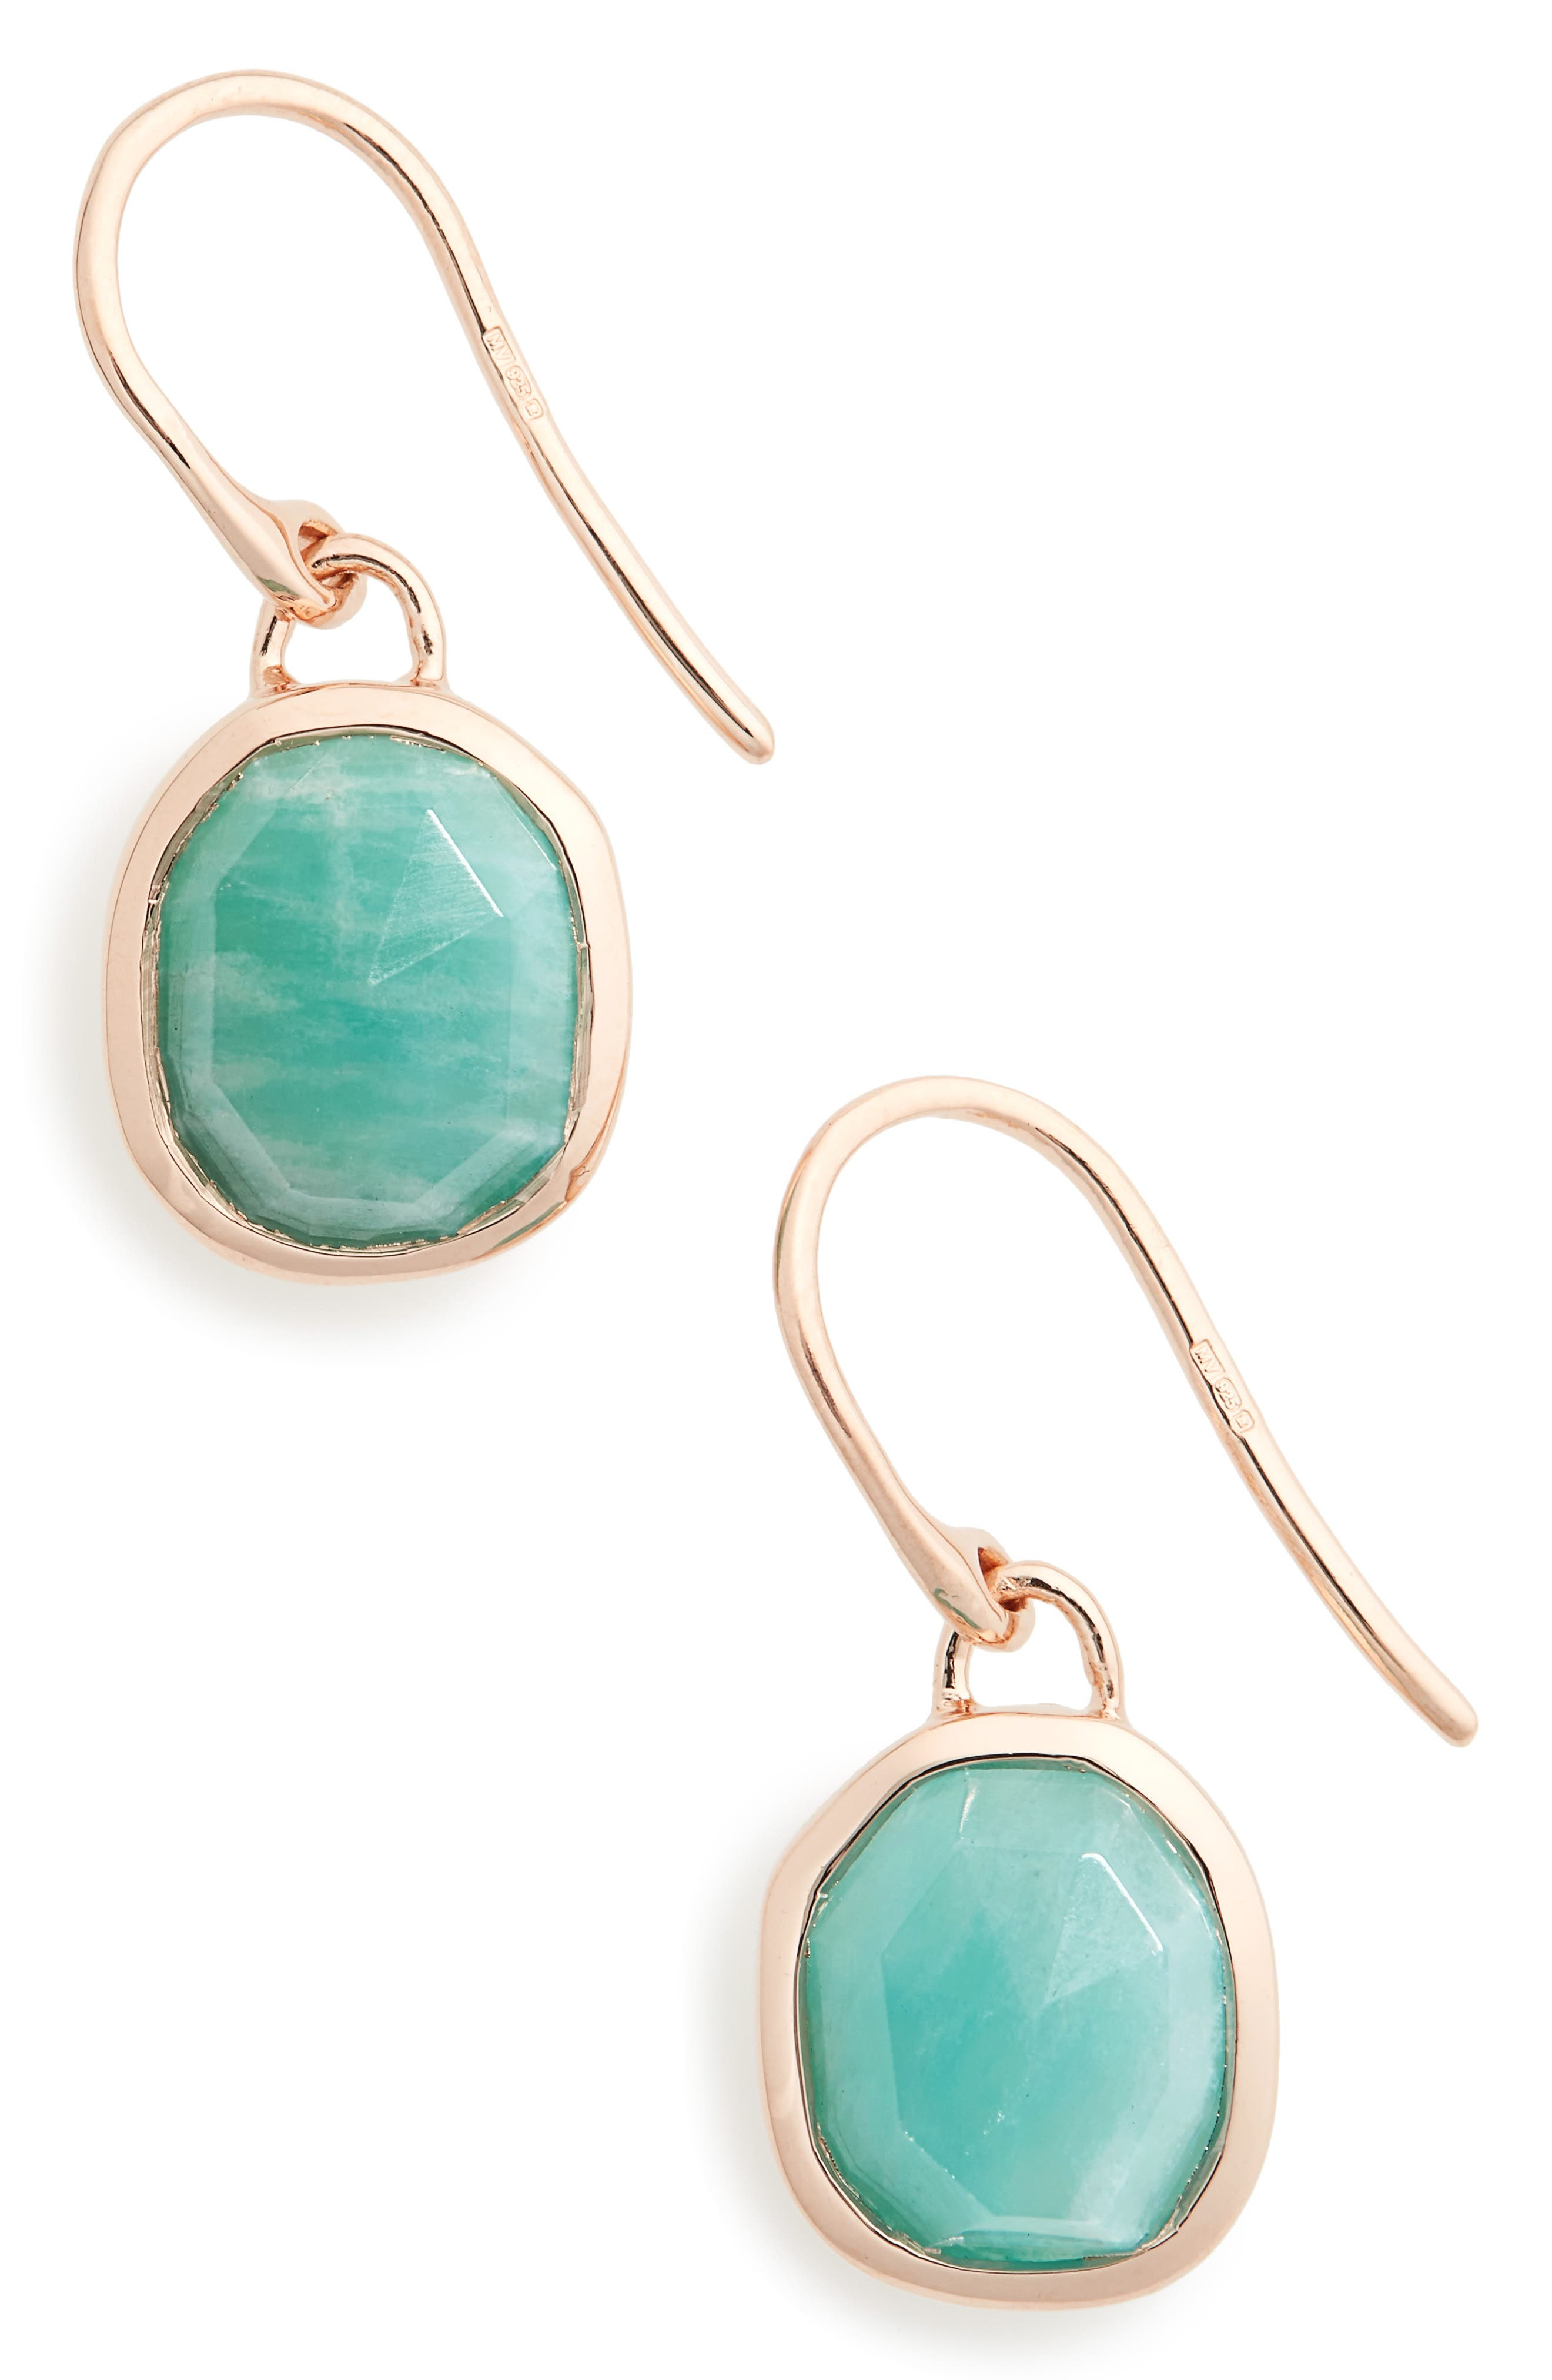 Monica Vinader Siren Semiprecious Stone Drop Earrings